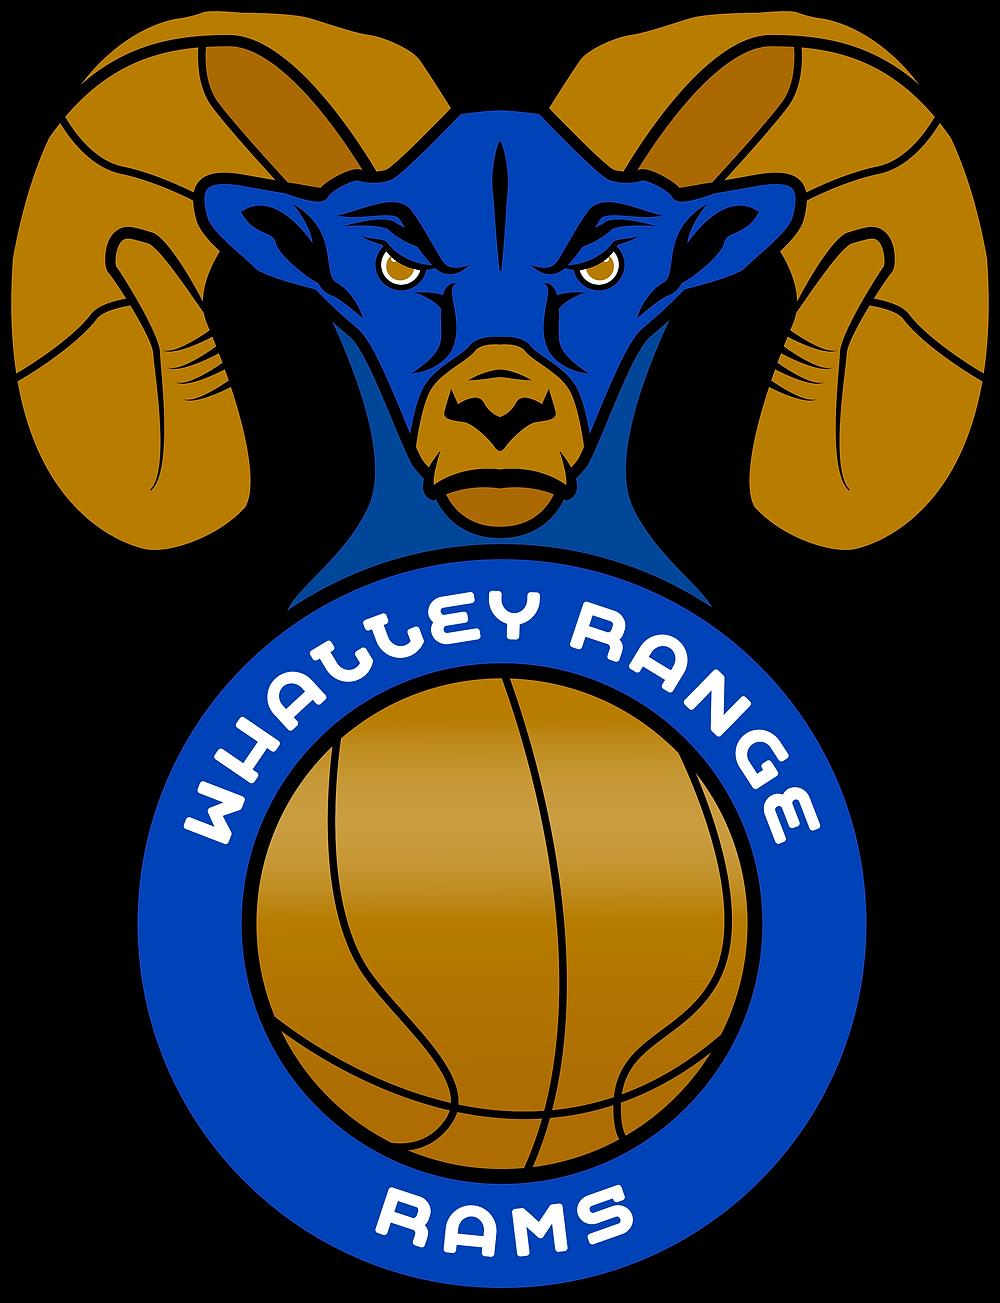 Whalley Range Rams Basketball Logo. By Jordan Bell @jordanadamb